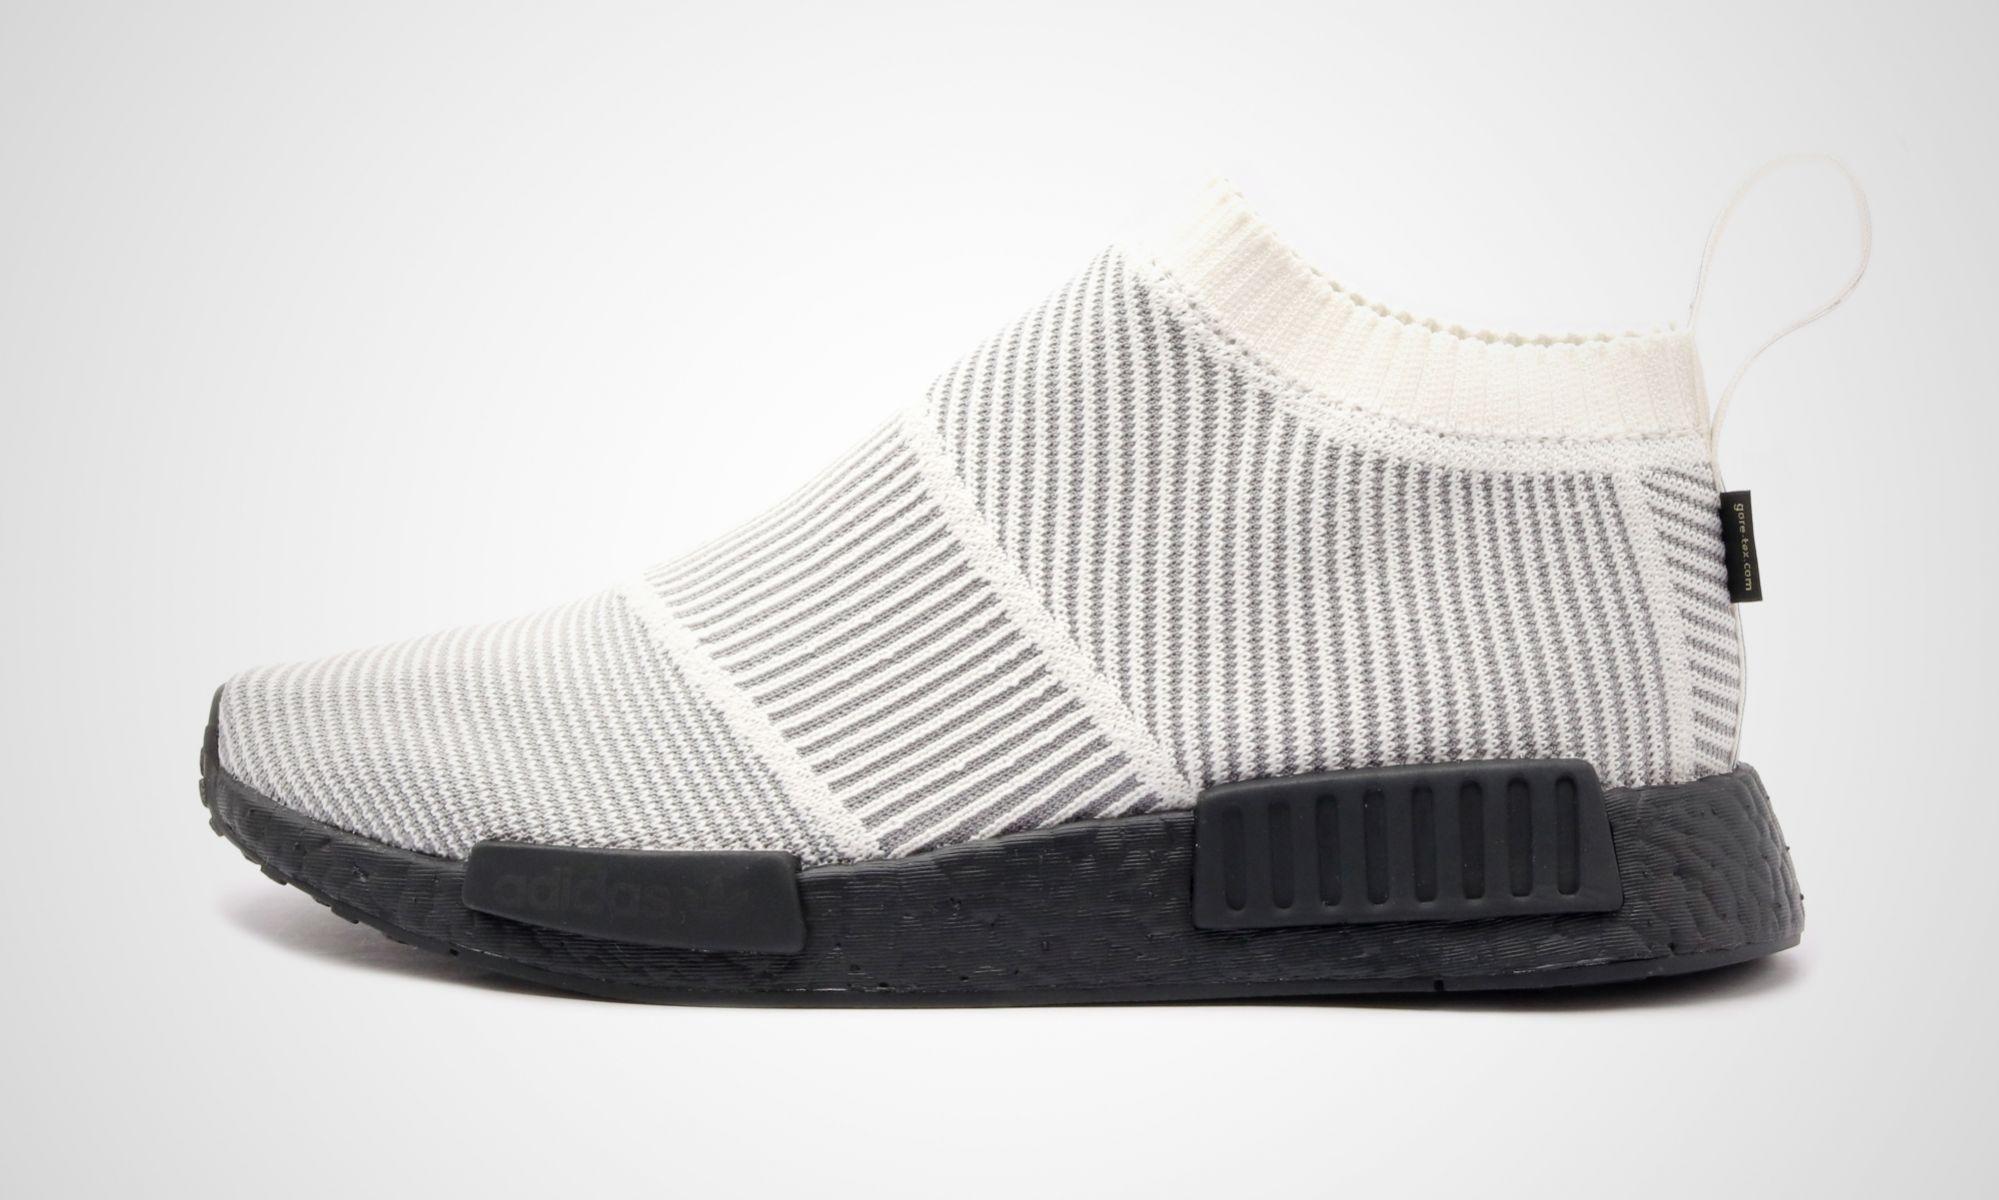 adidas nmd cs1 gore tex dead stock sneakerblog. Black Bedroom Furniture Sets. Home Design Ideas